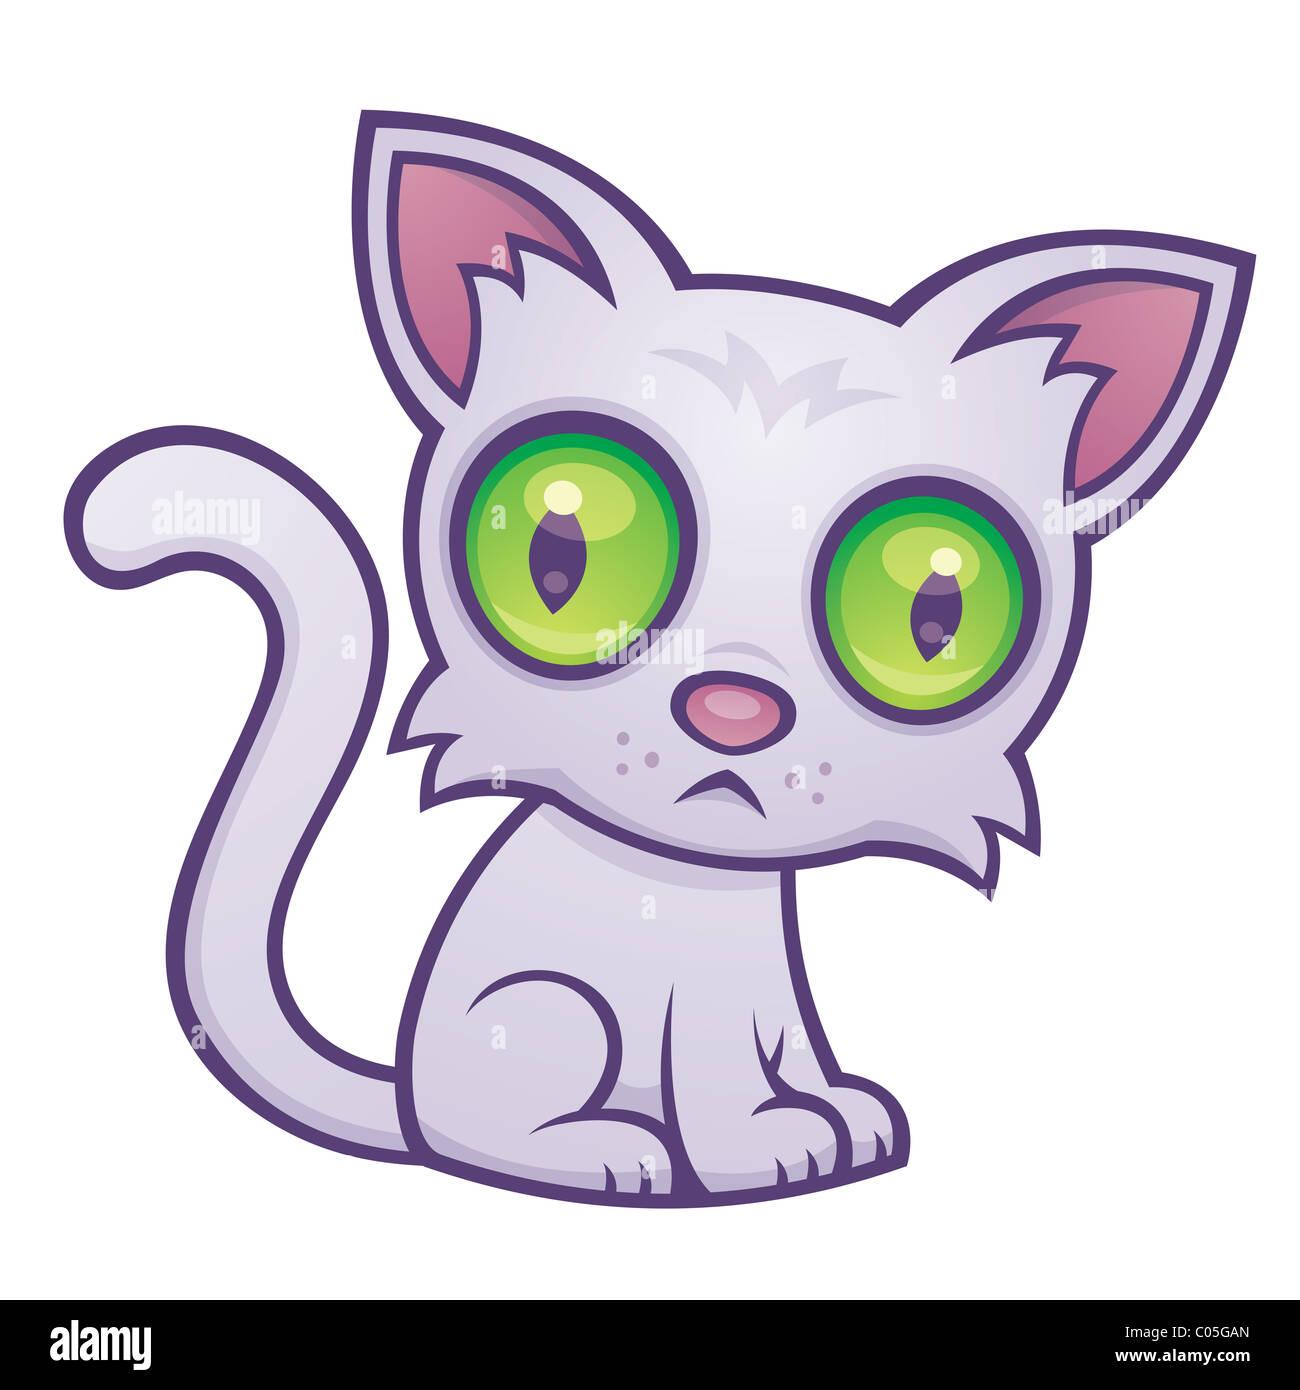 Vector cartoon illustration of a cute kitten with big green eyes